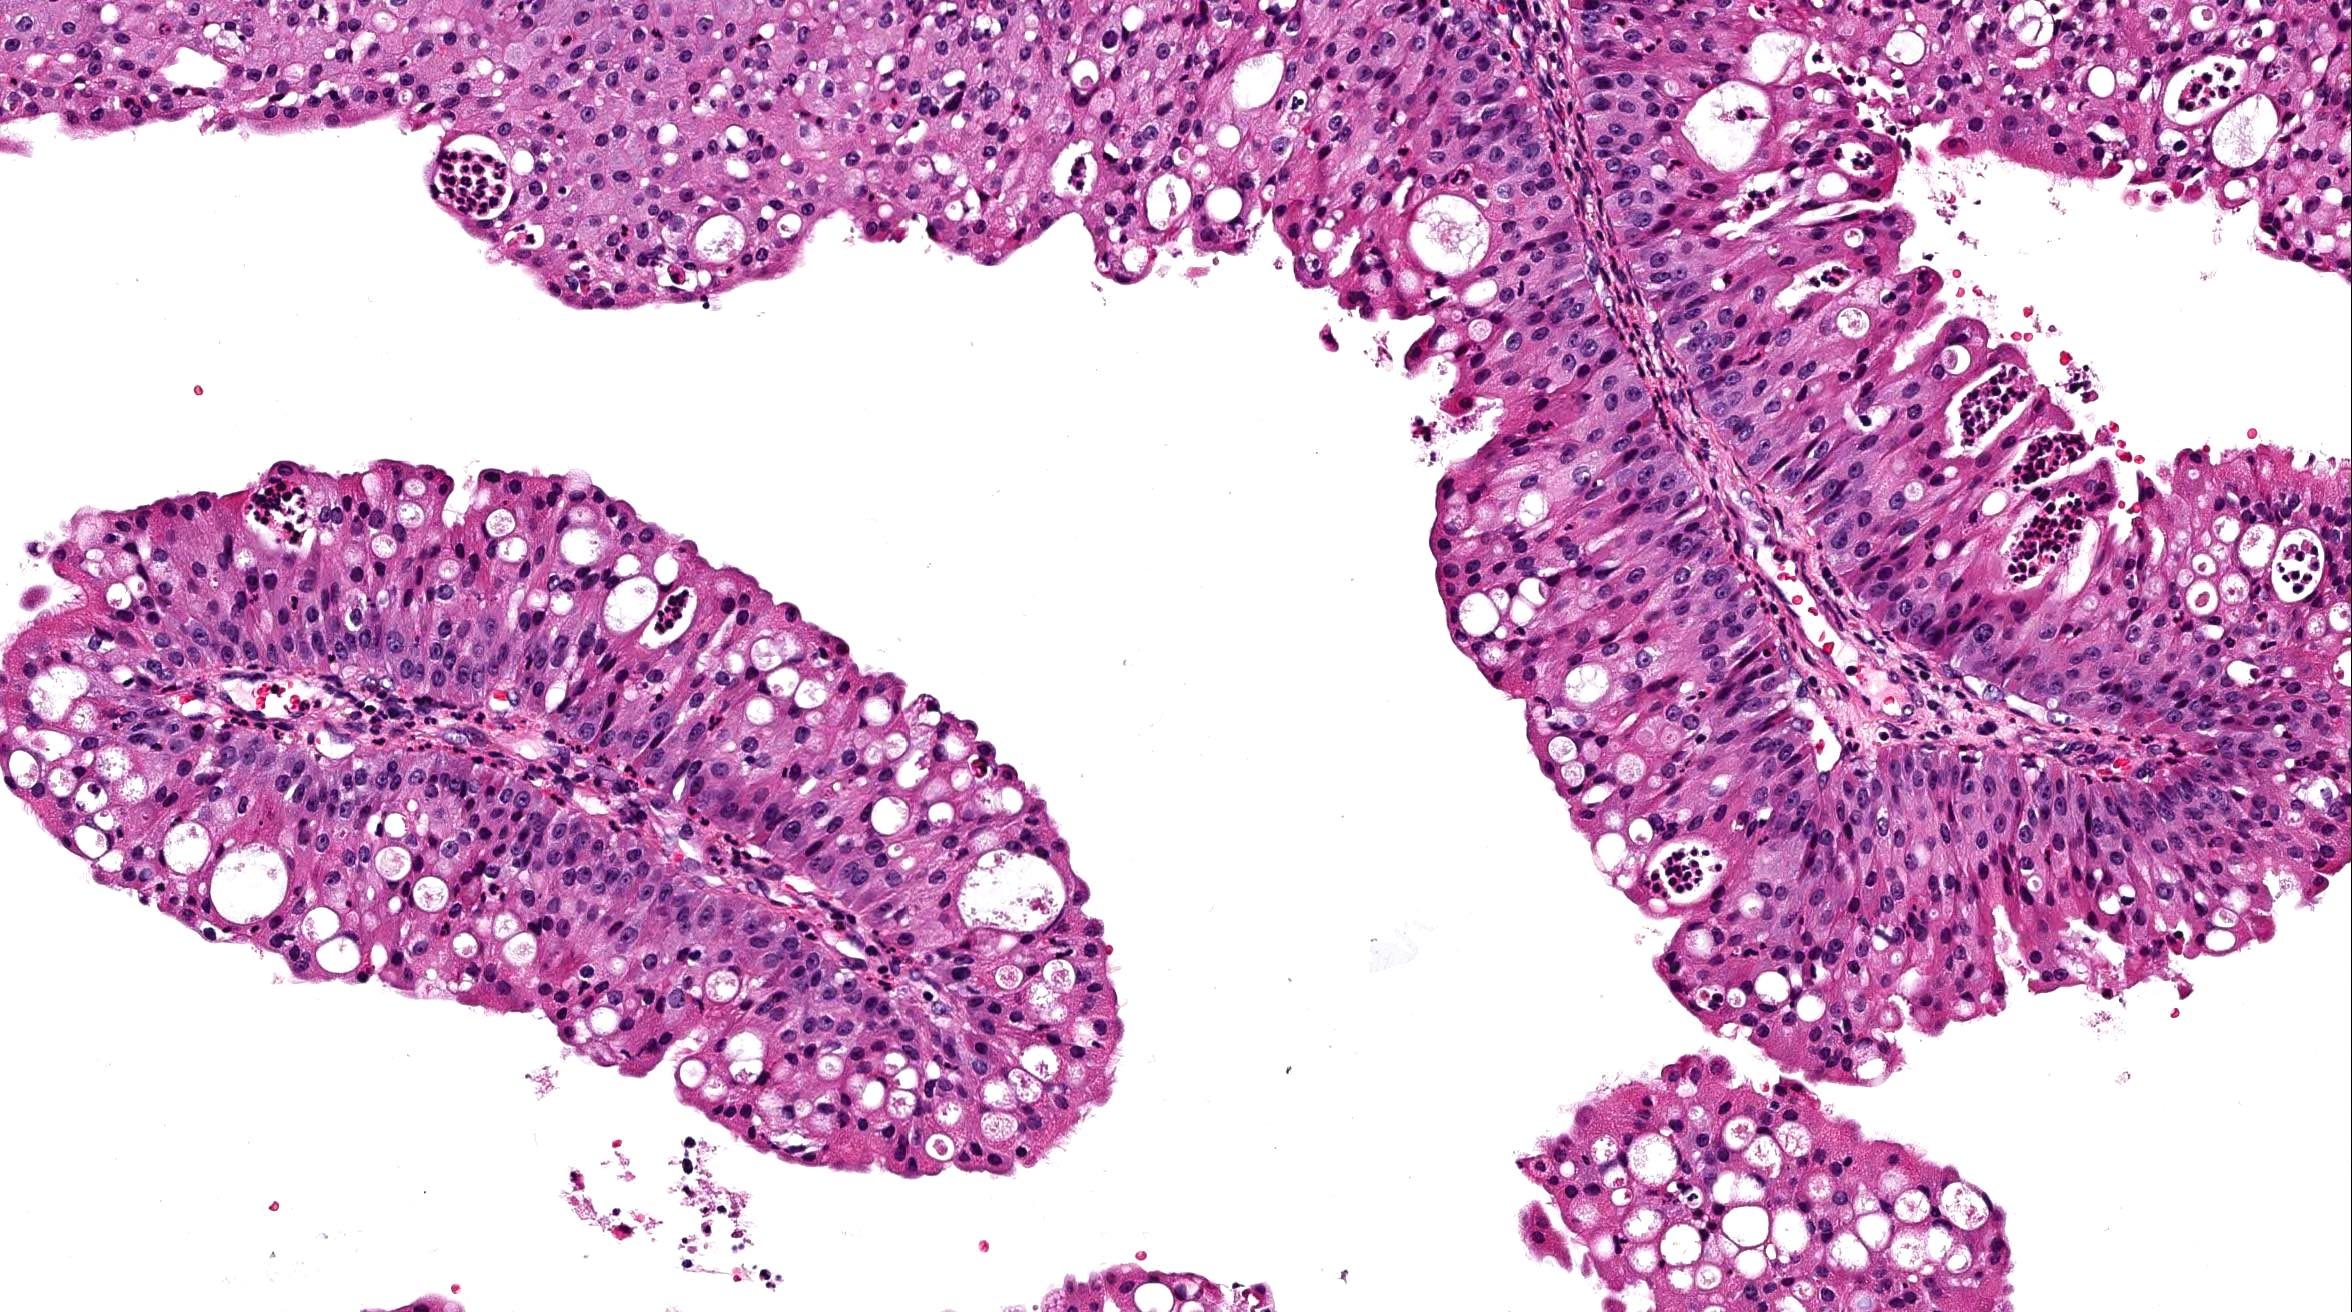 urothelial papilloma hpv neuroendocrine cancer nutrition